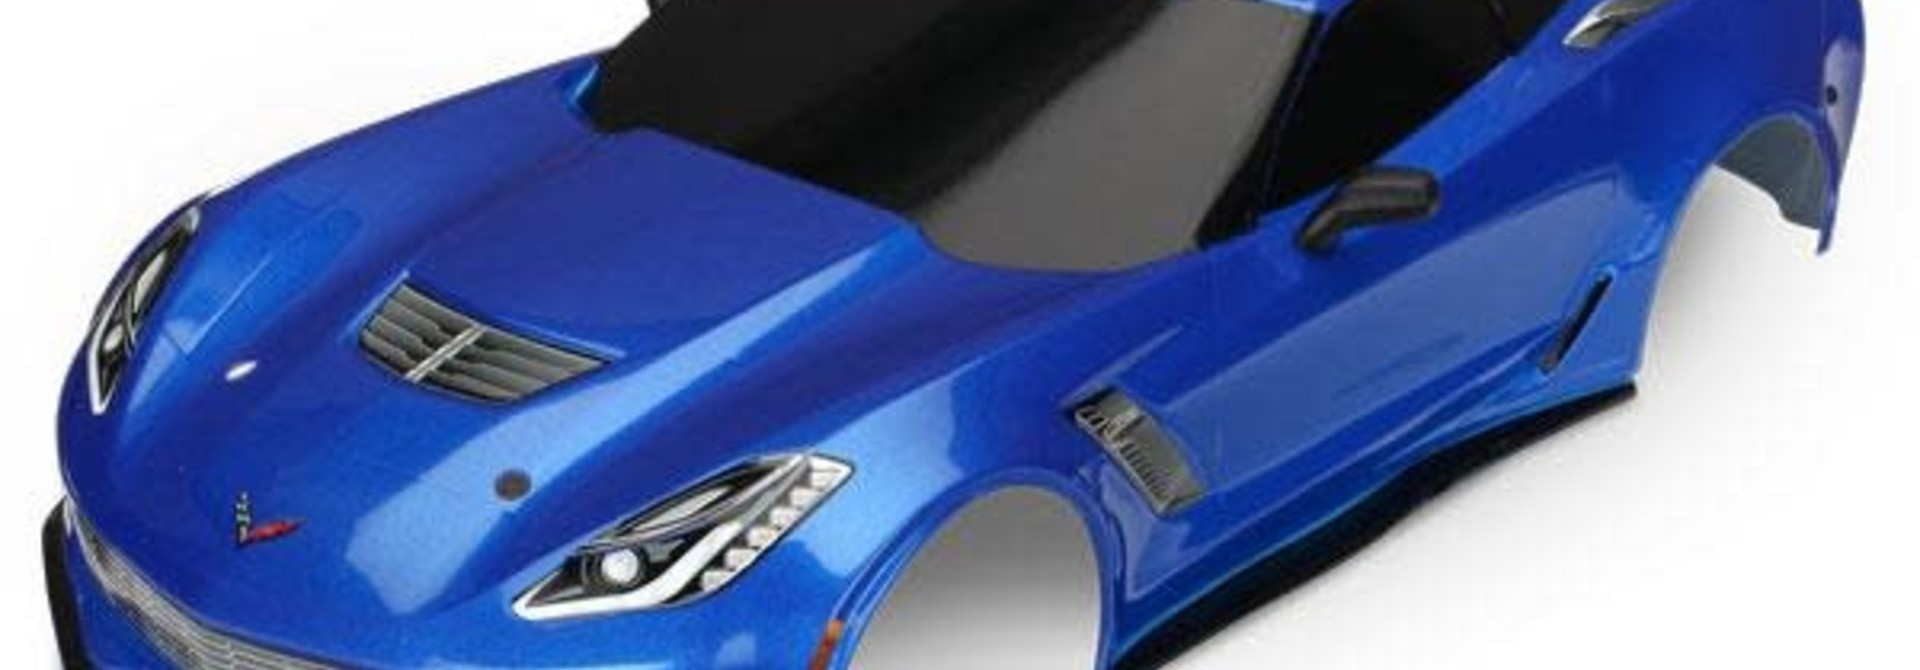 Body, Chevrolet Corvette Z06, blue (painted, decals applied)